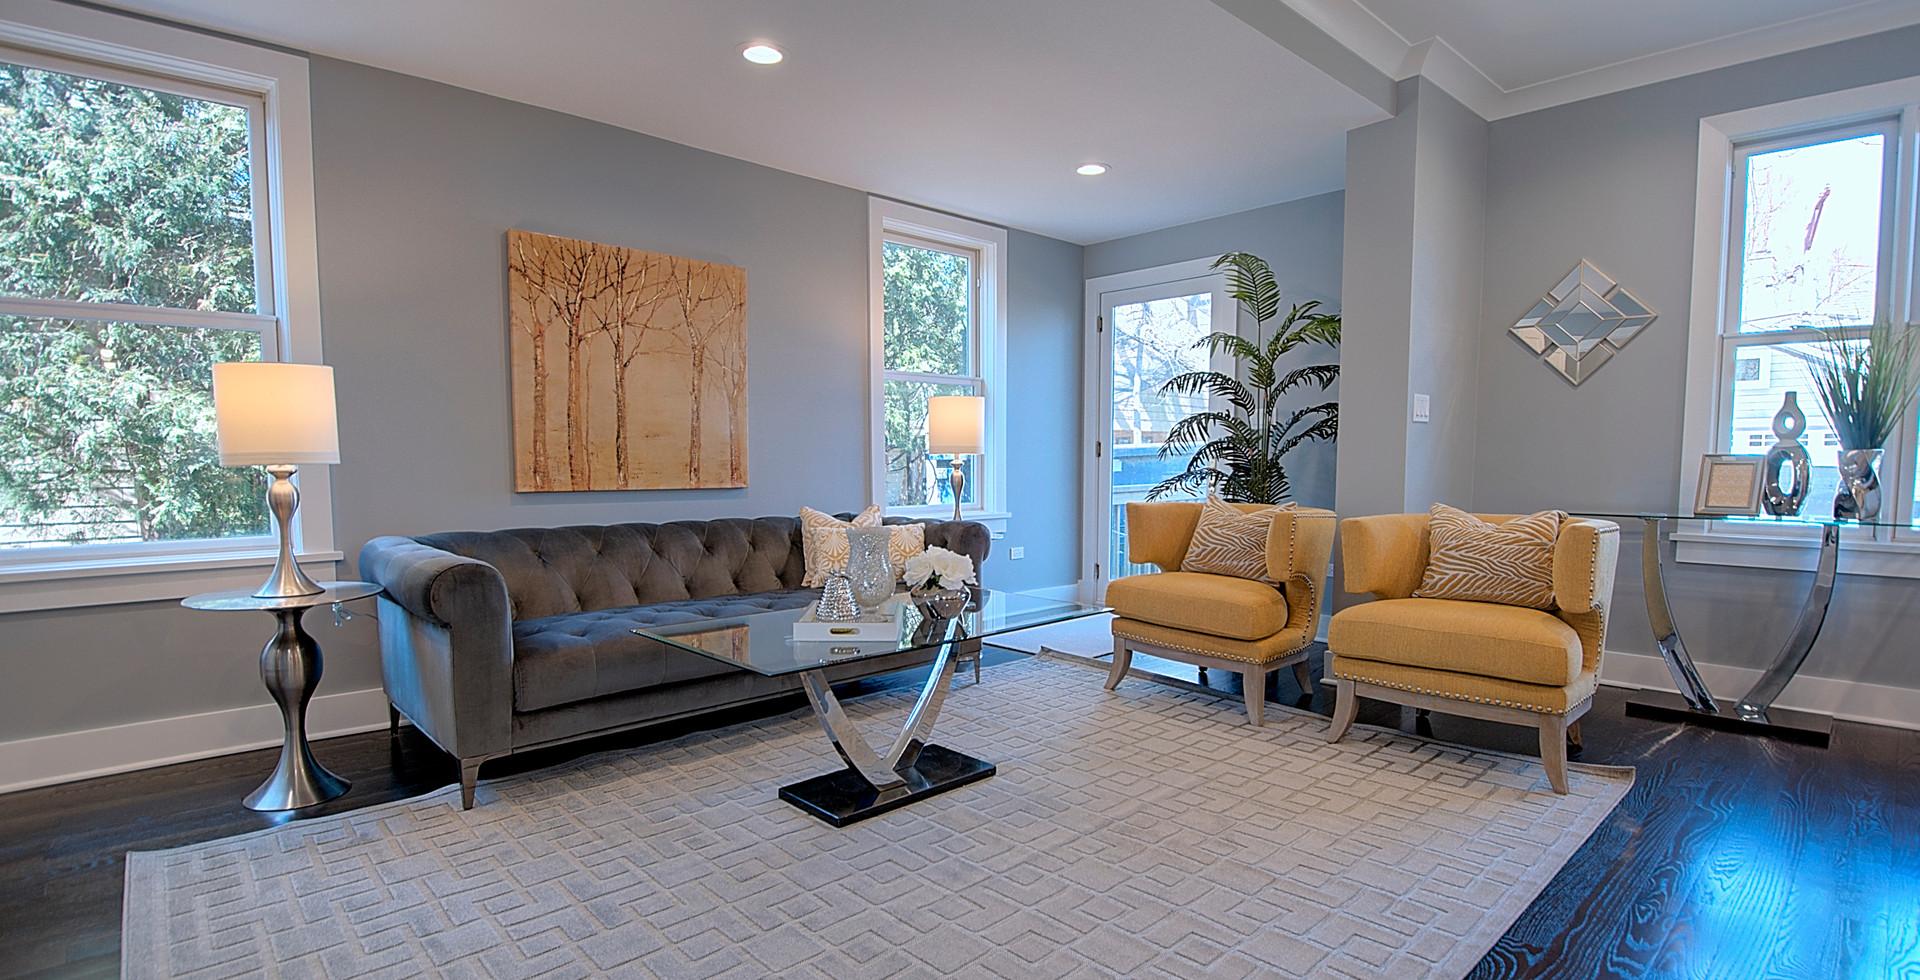 Living Room in Wilmette designed by MRM Home Design.jpg